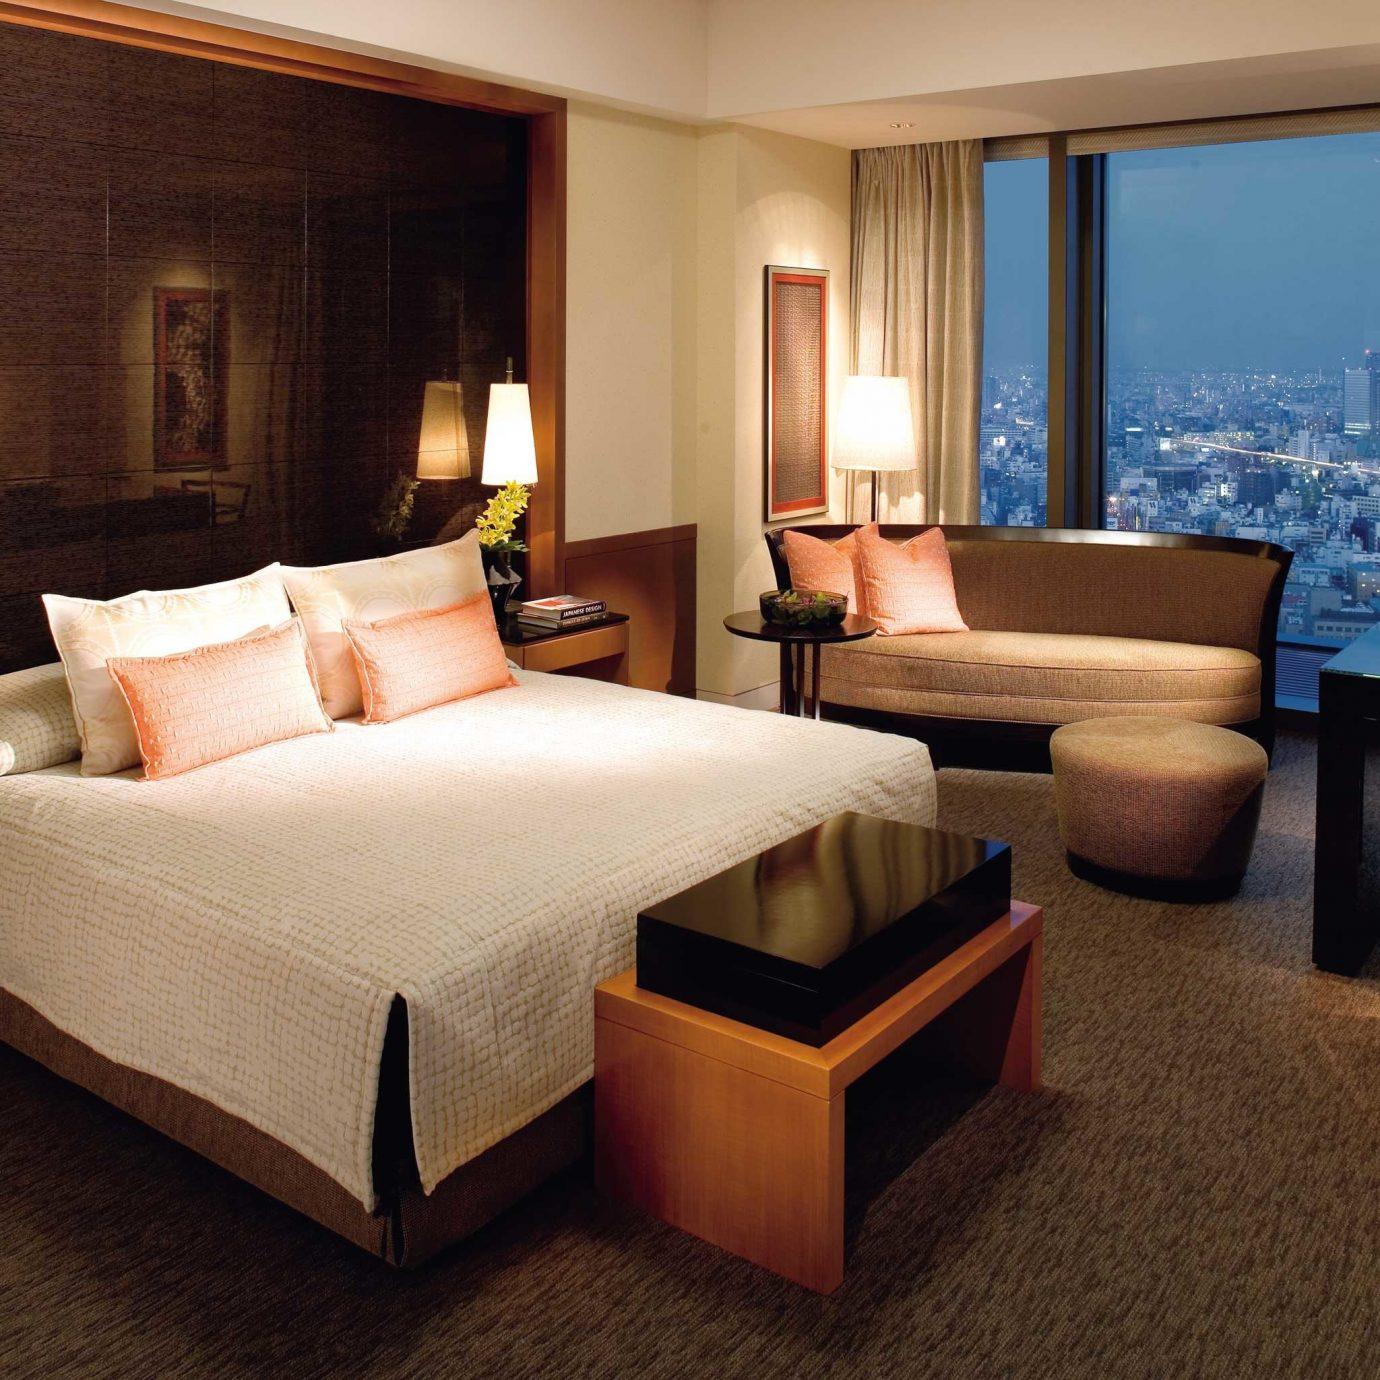 Bedroom City Elegant Hotels Japan Luxury Modern Romance Scenic views Tokyo property Suite living room home Villa condominium cottage Resort